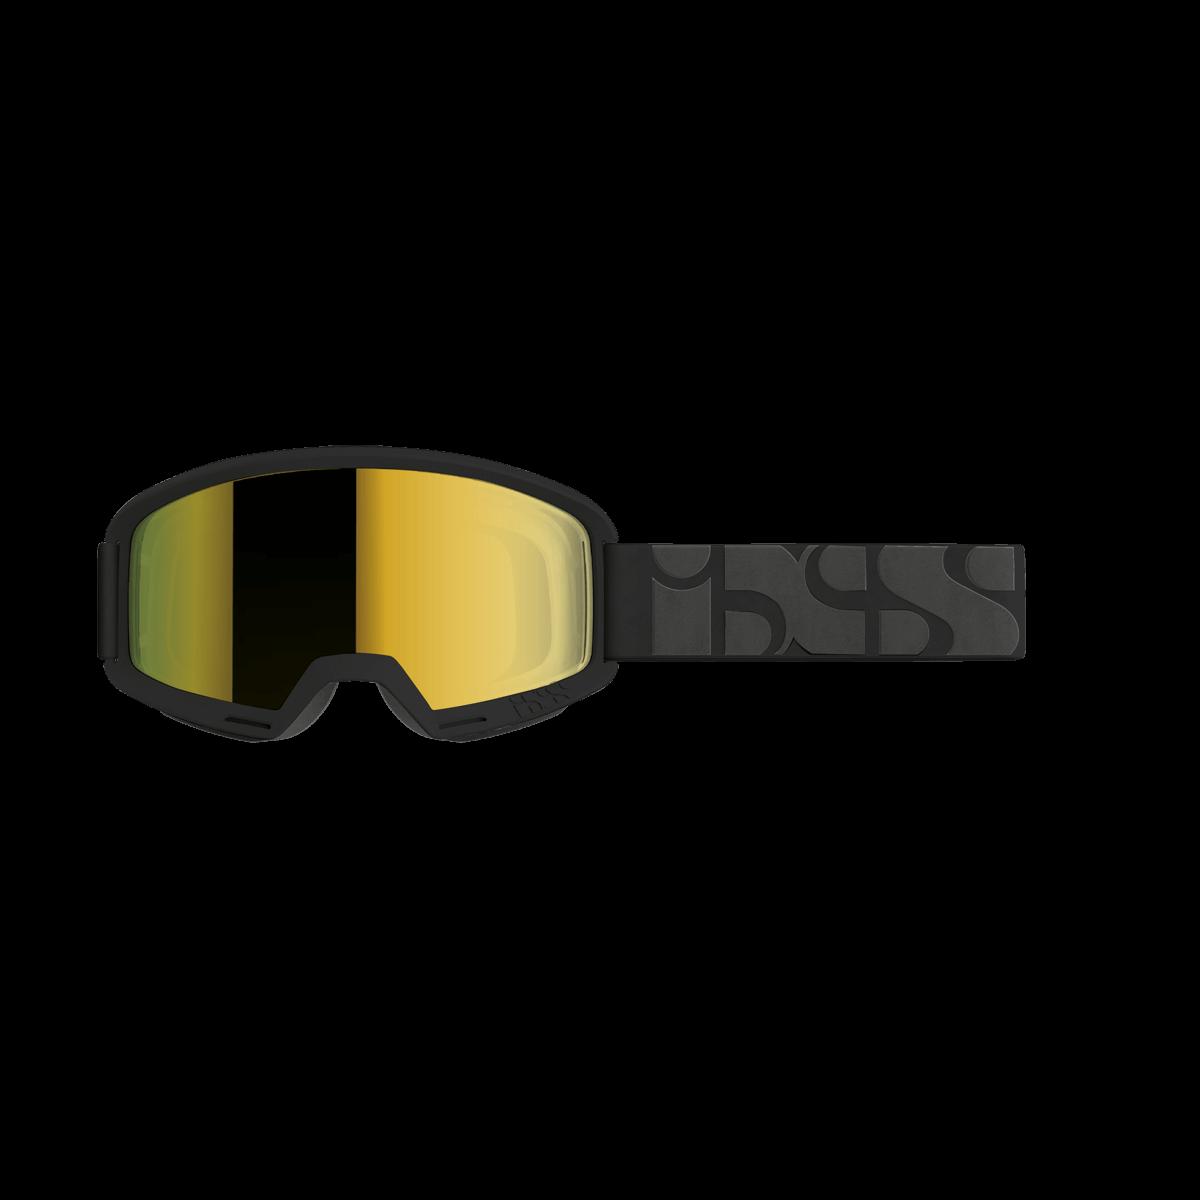 iXS brýle Hack black / mirror gold on